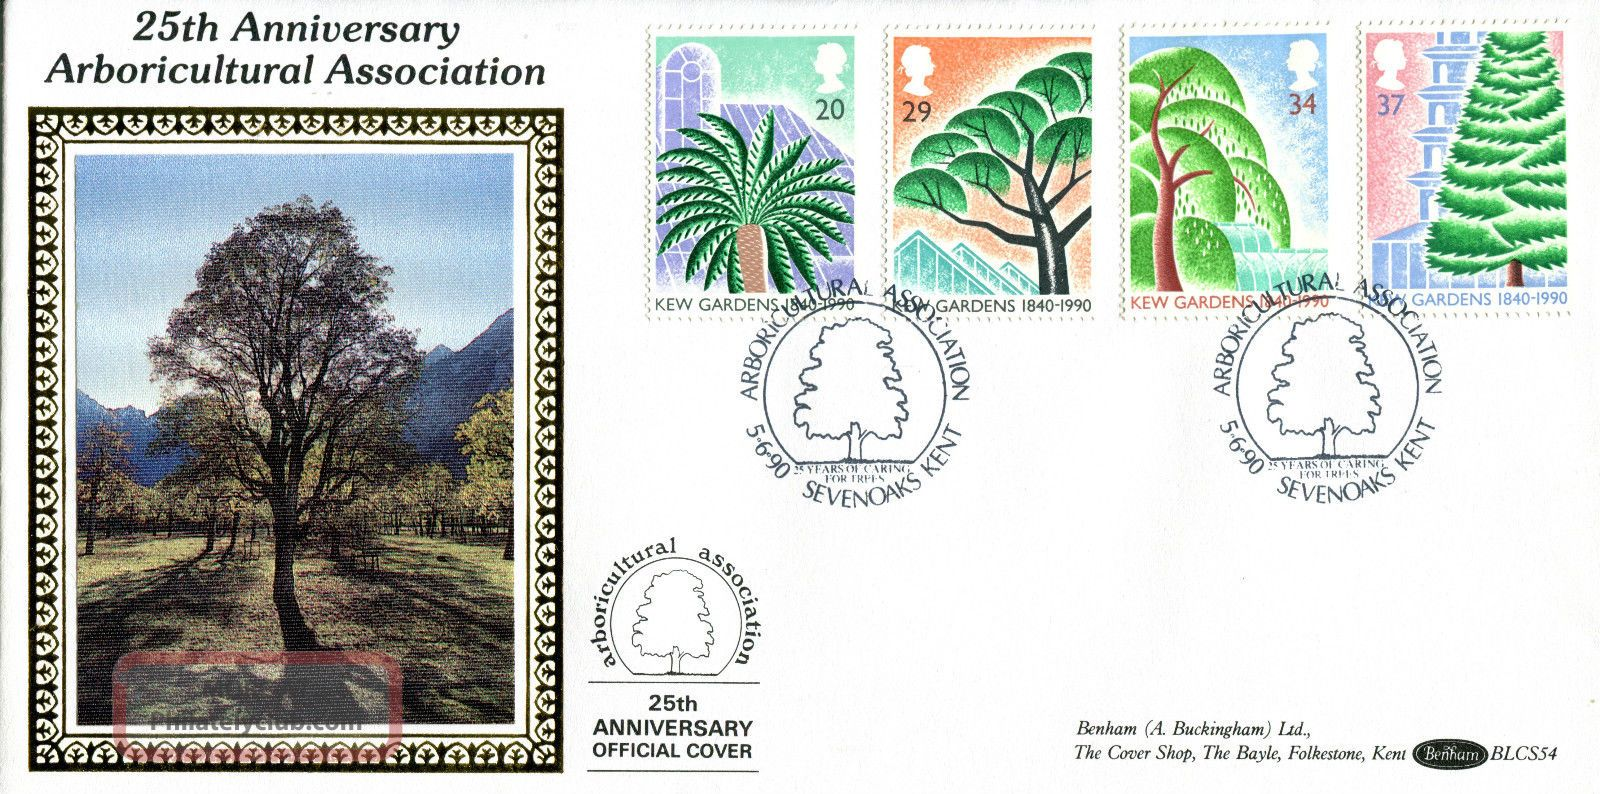 5 June 1990 Kew Gardens Benham Blcs 54 First Day Cover Arborial Association Shs Topical Stamps photo